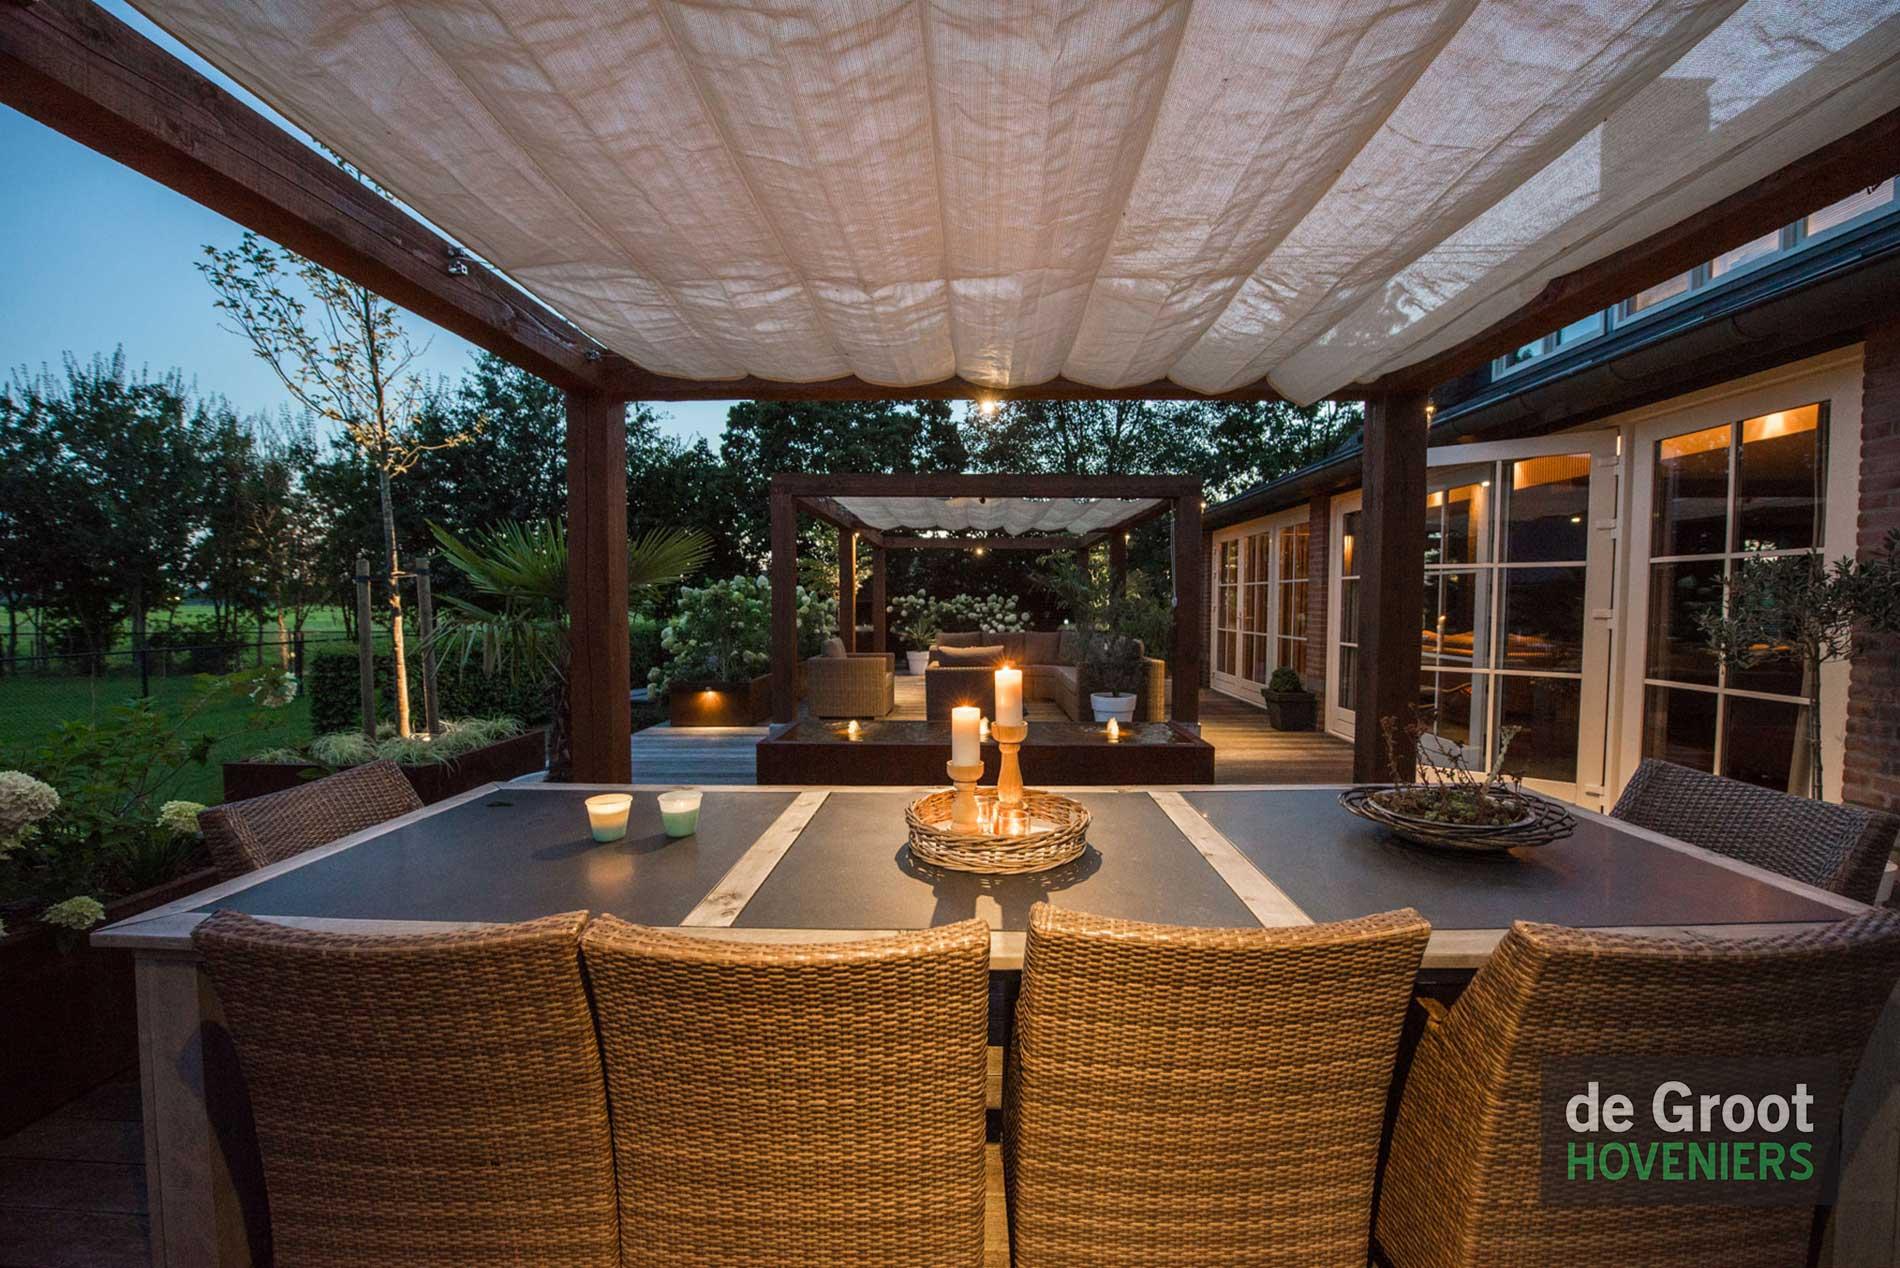 De-Groot-Hoveniers-Tuinen-Uden-Gogh-pergola-Veranda-lounge-set ...